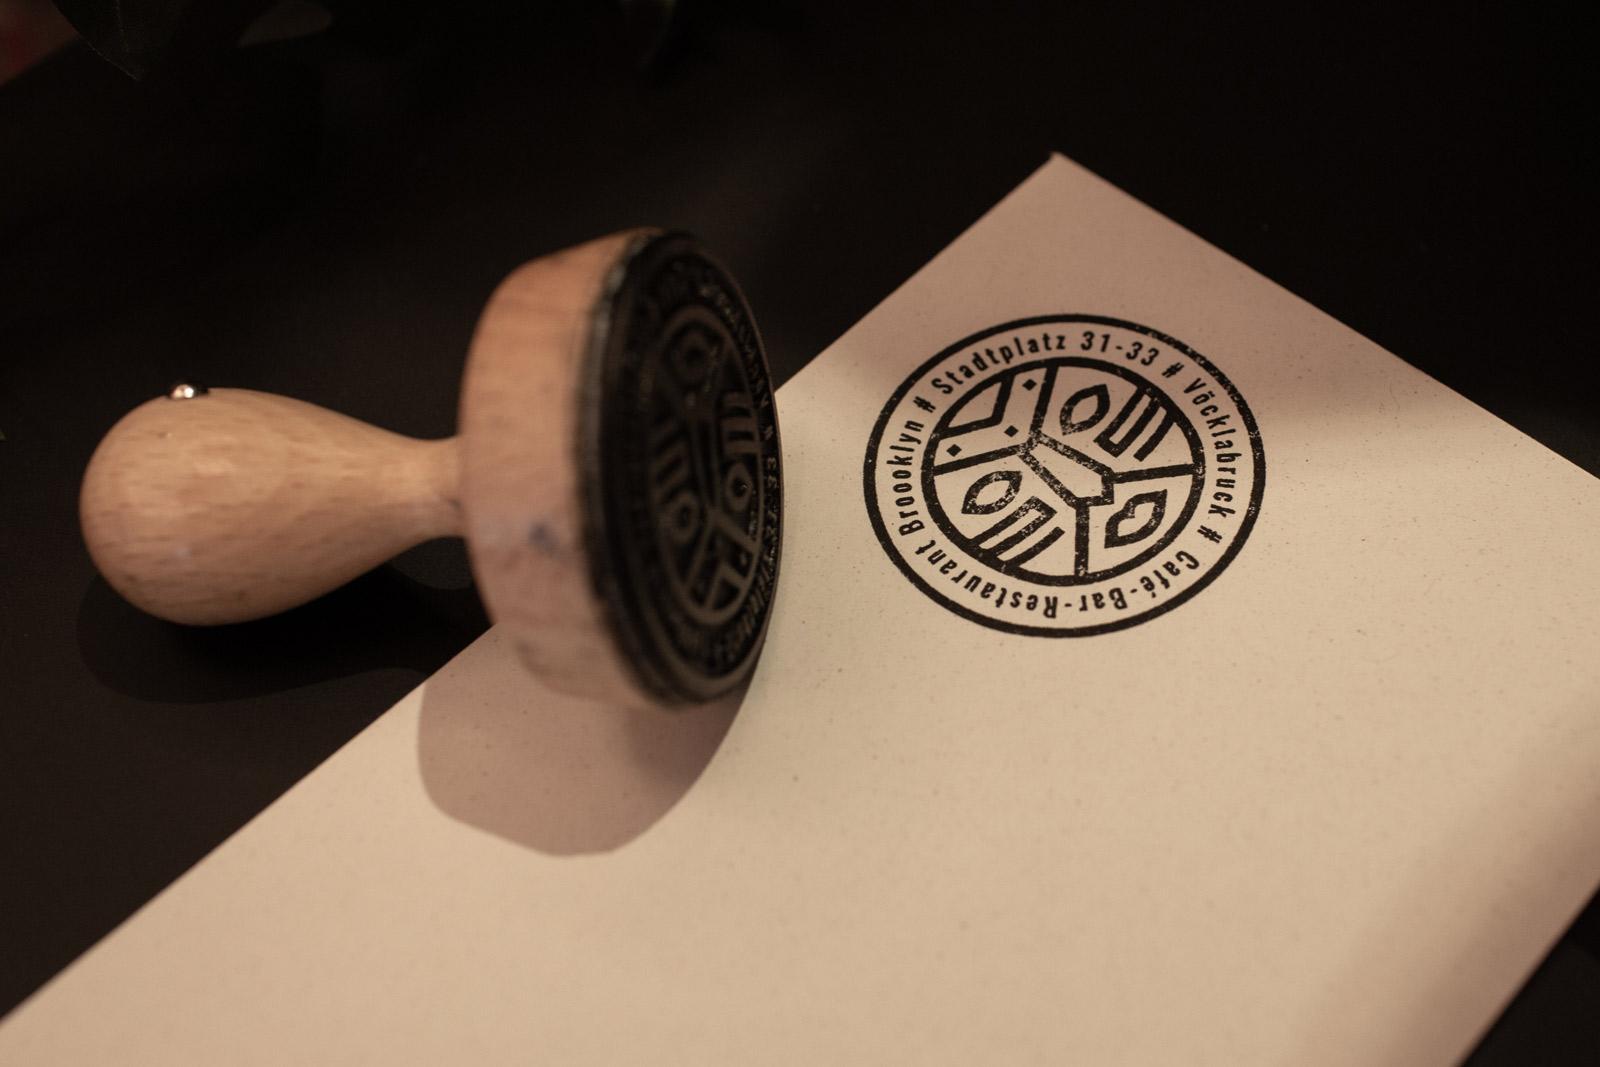 stempel-branding_broooklyn-anti-form-michael-schumer